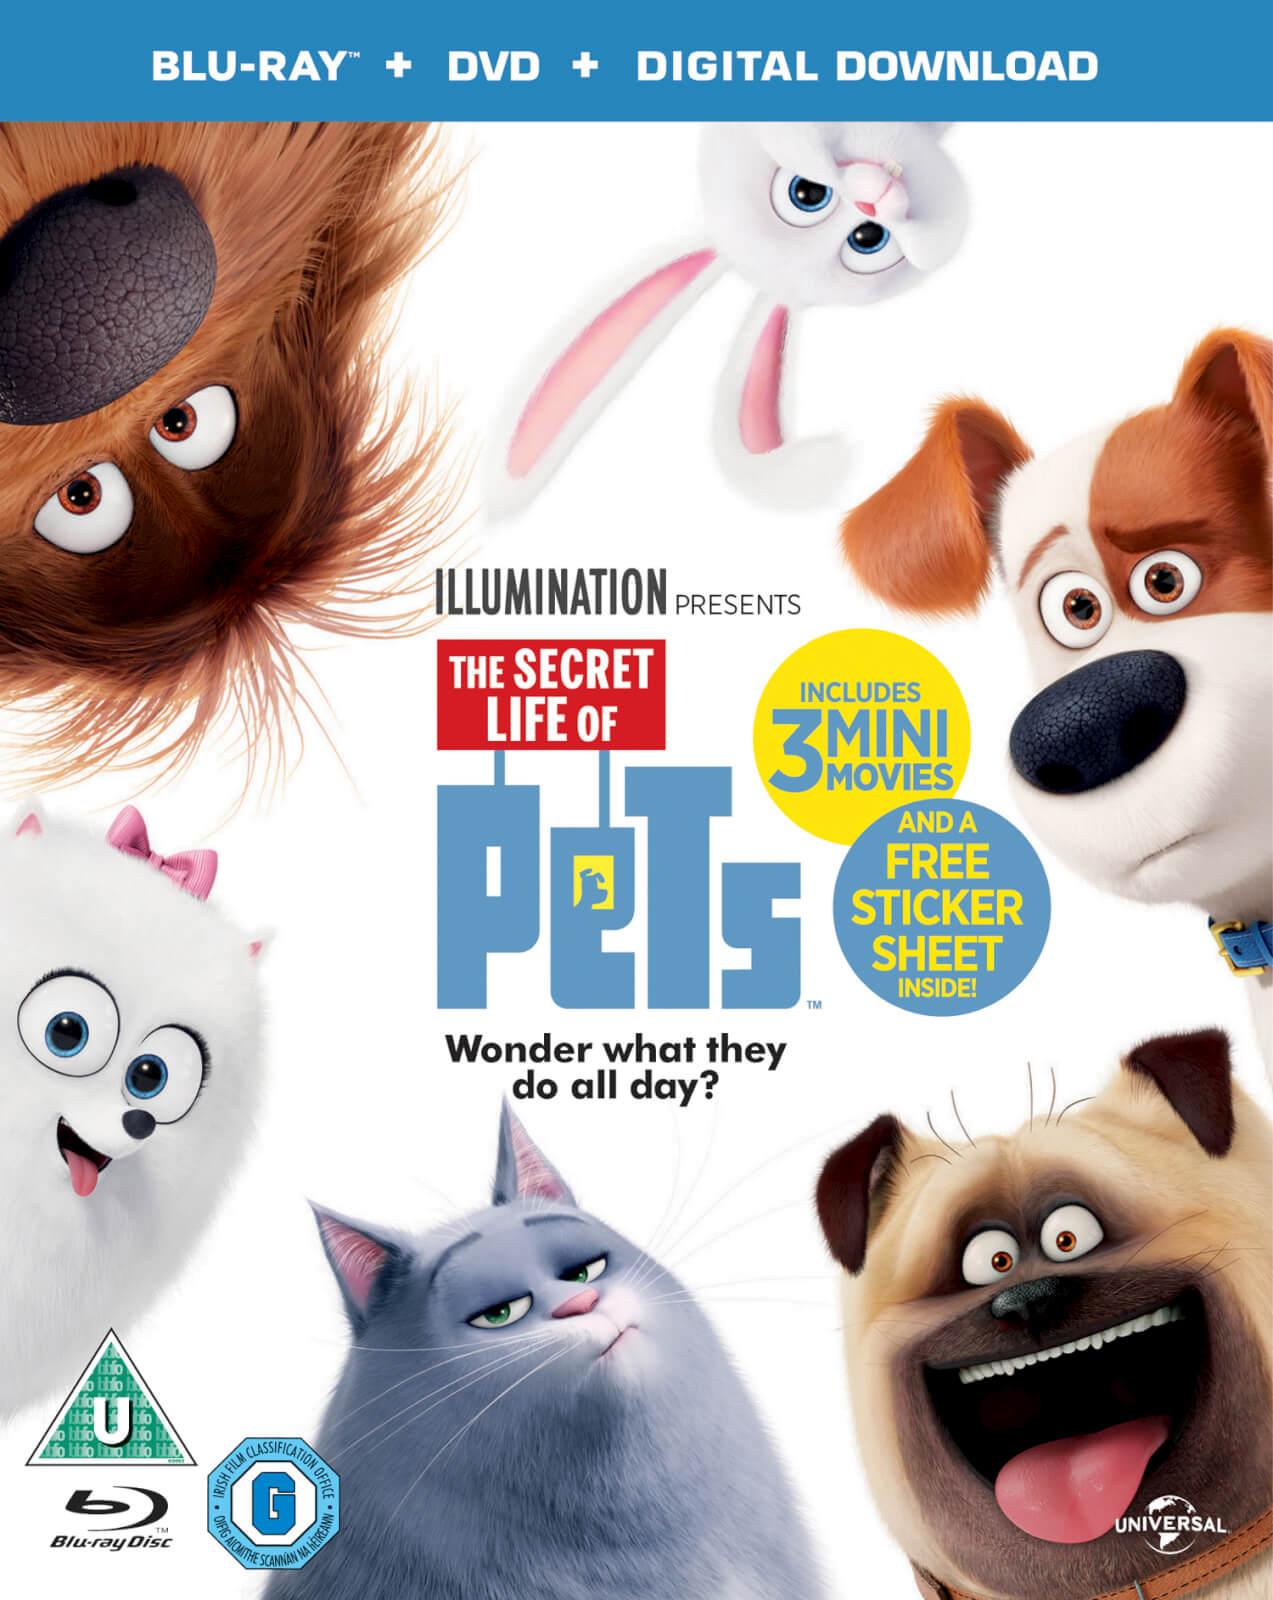 The Secret Life of Pets Blu-Ray + DVD + Digital Copy £3.49 @ Amazon Prime / £4.48 Non Prime